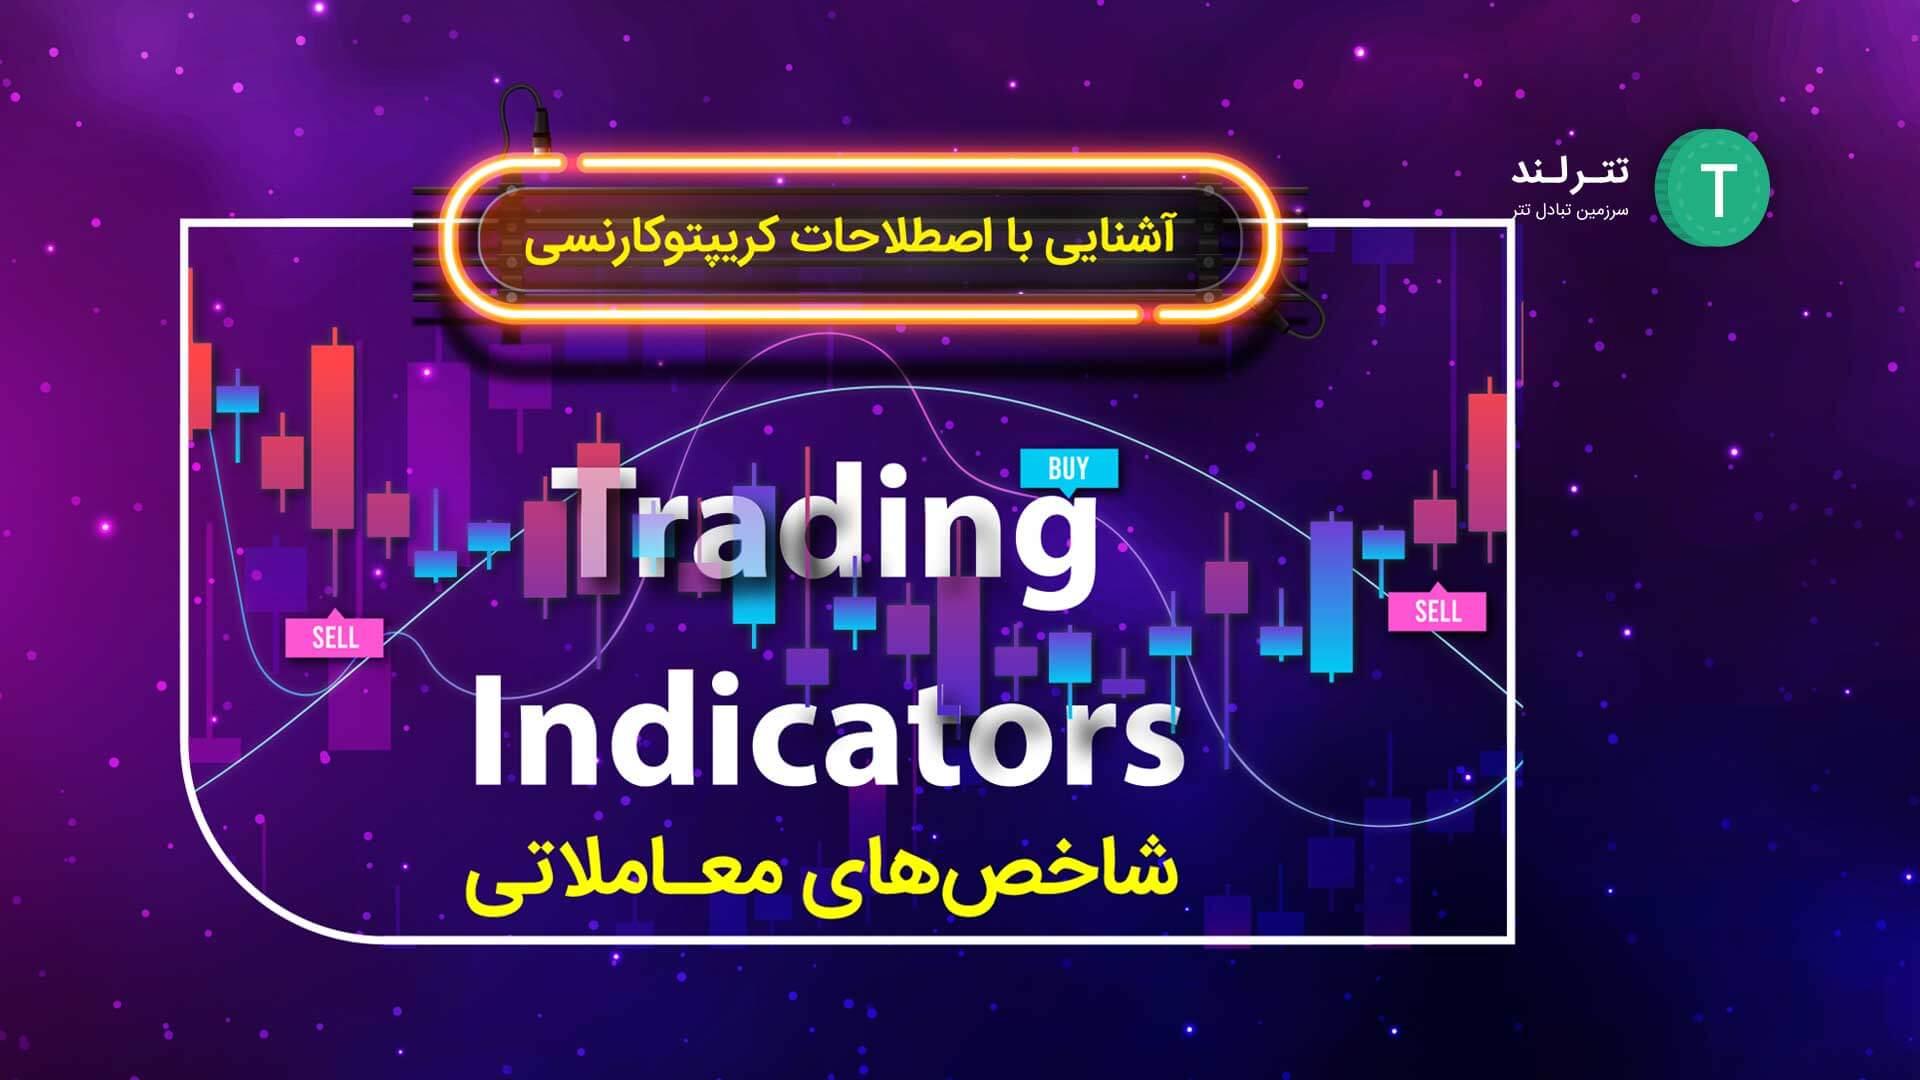 Trading-indicators